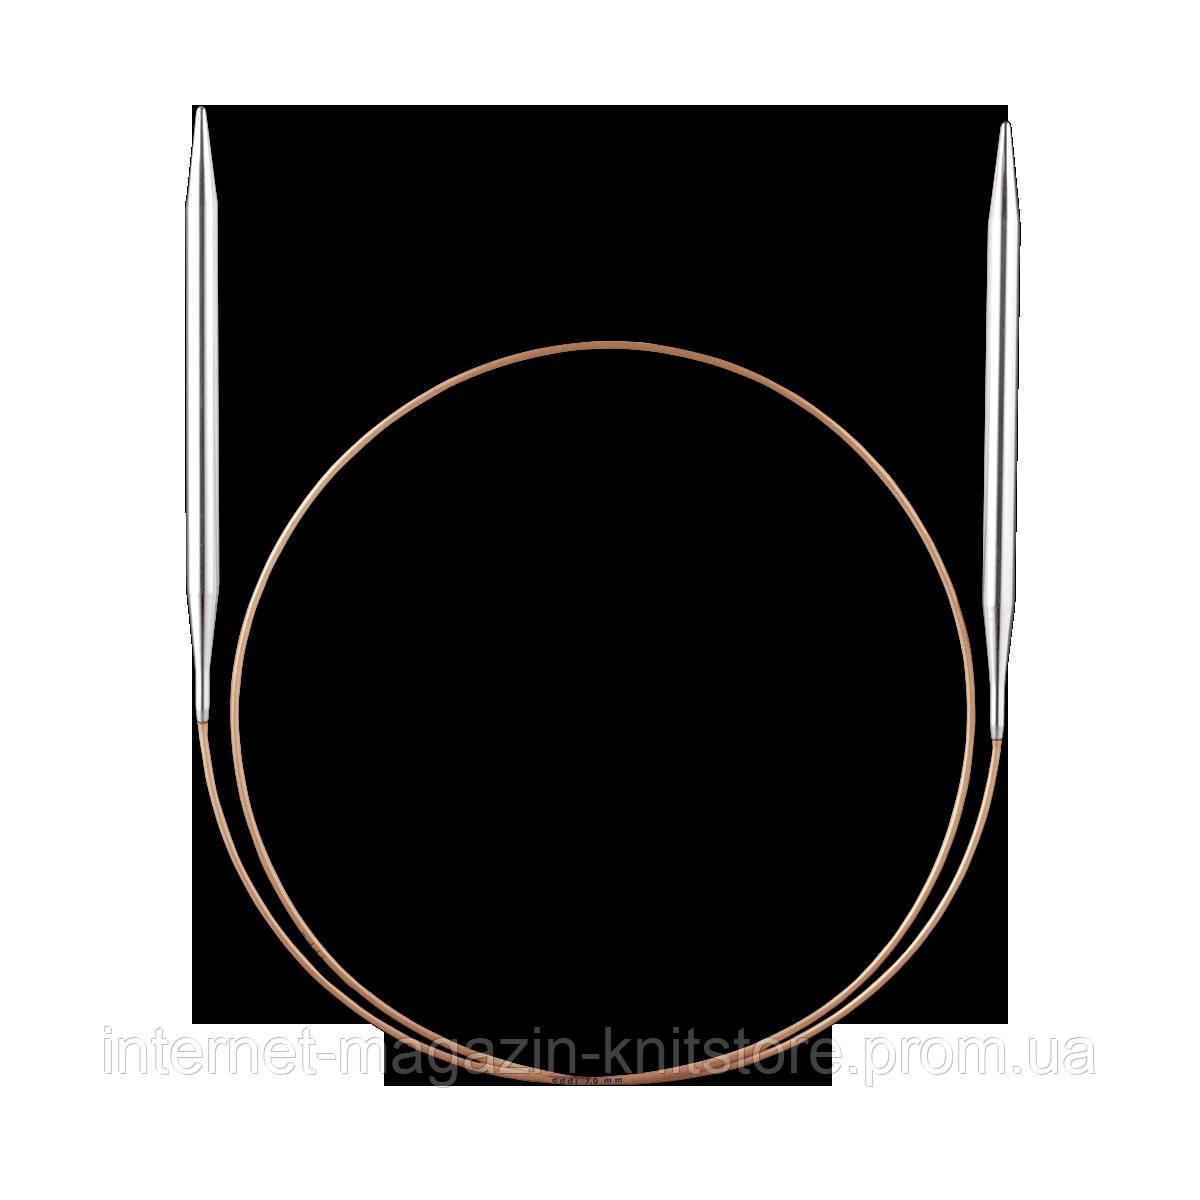 Спицы Addi 80 см/5 мм круговые